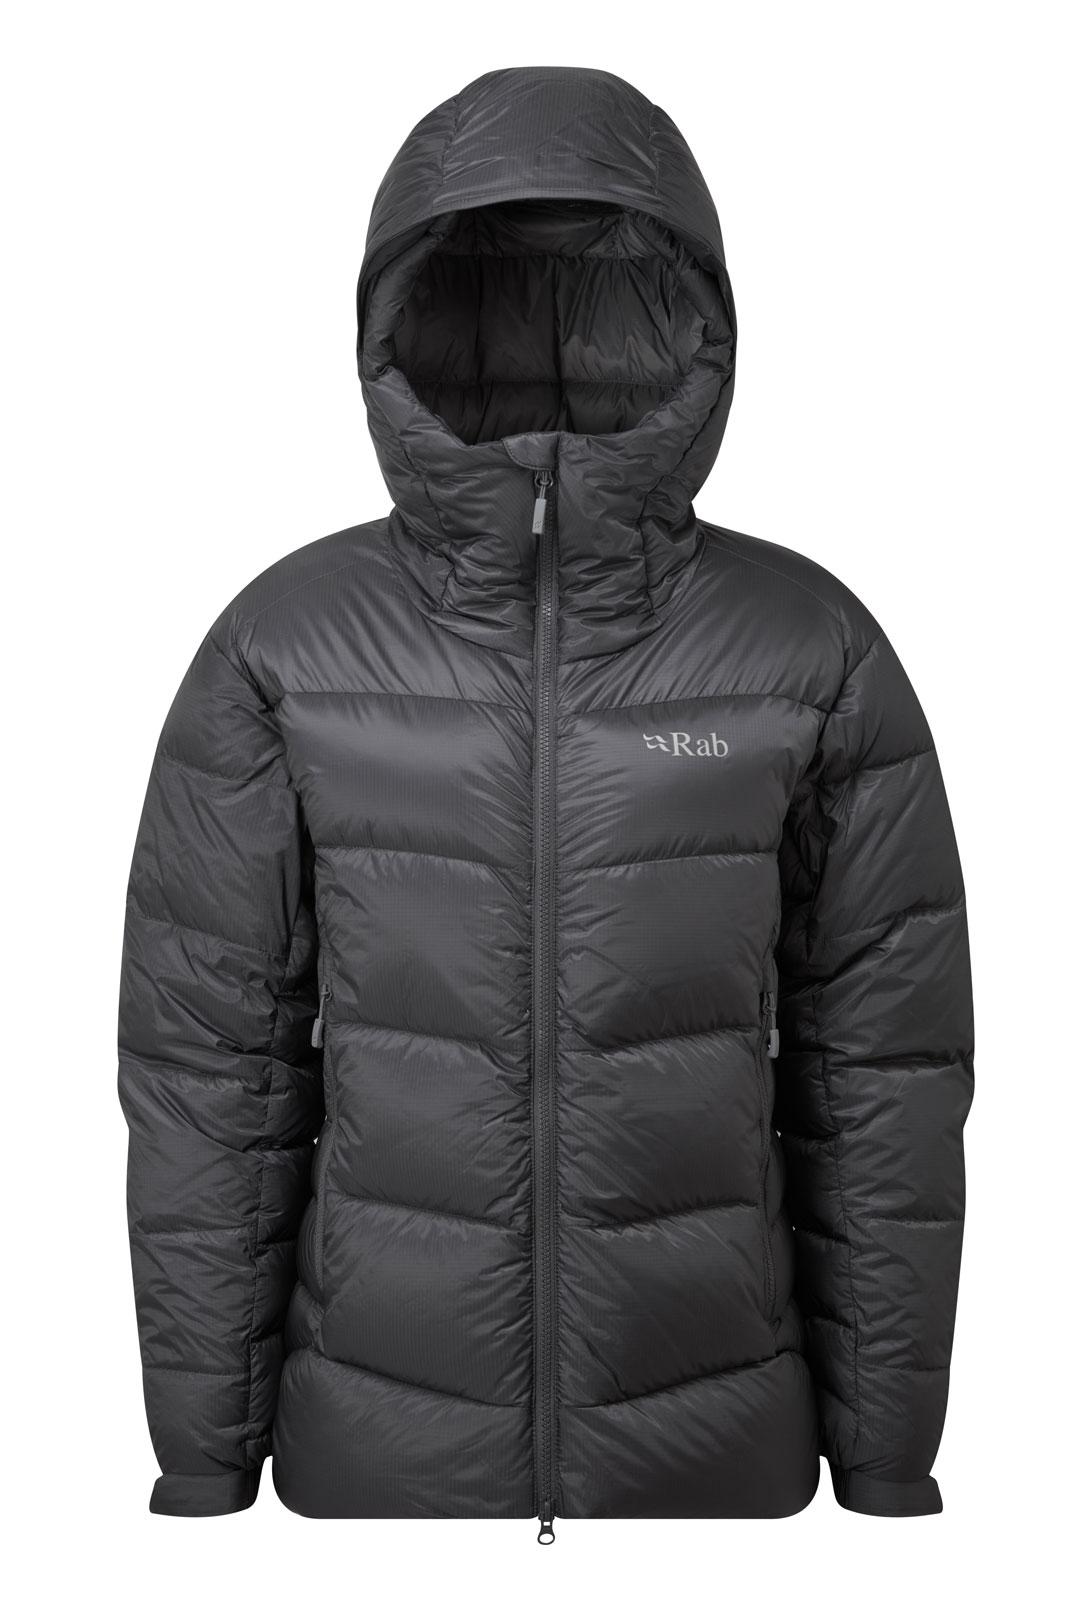 a5512d76 Rab Positron Pro Jacket | Sportsnett